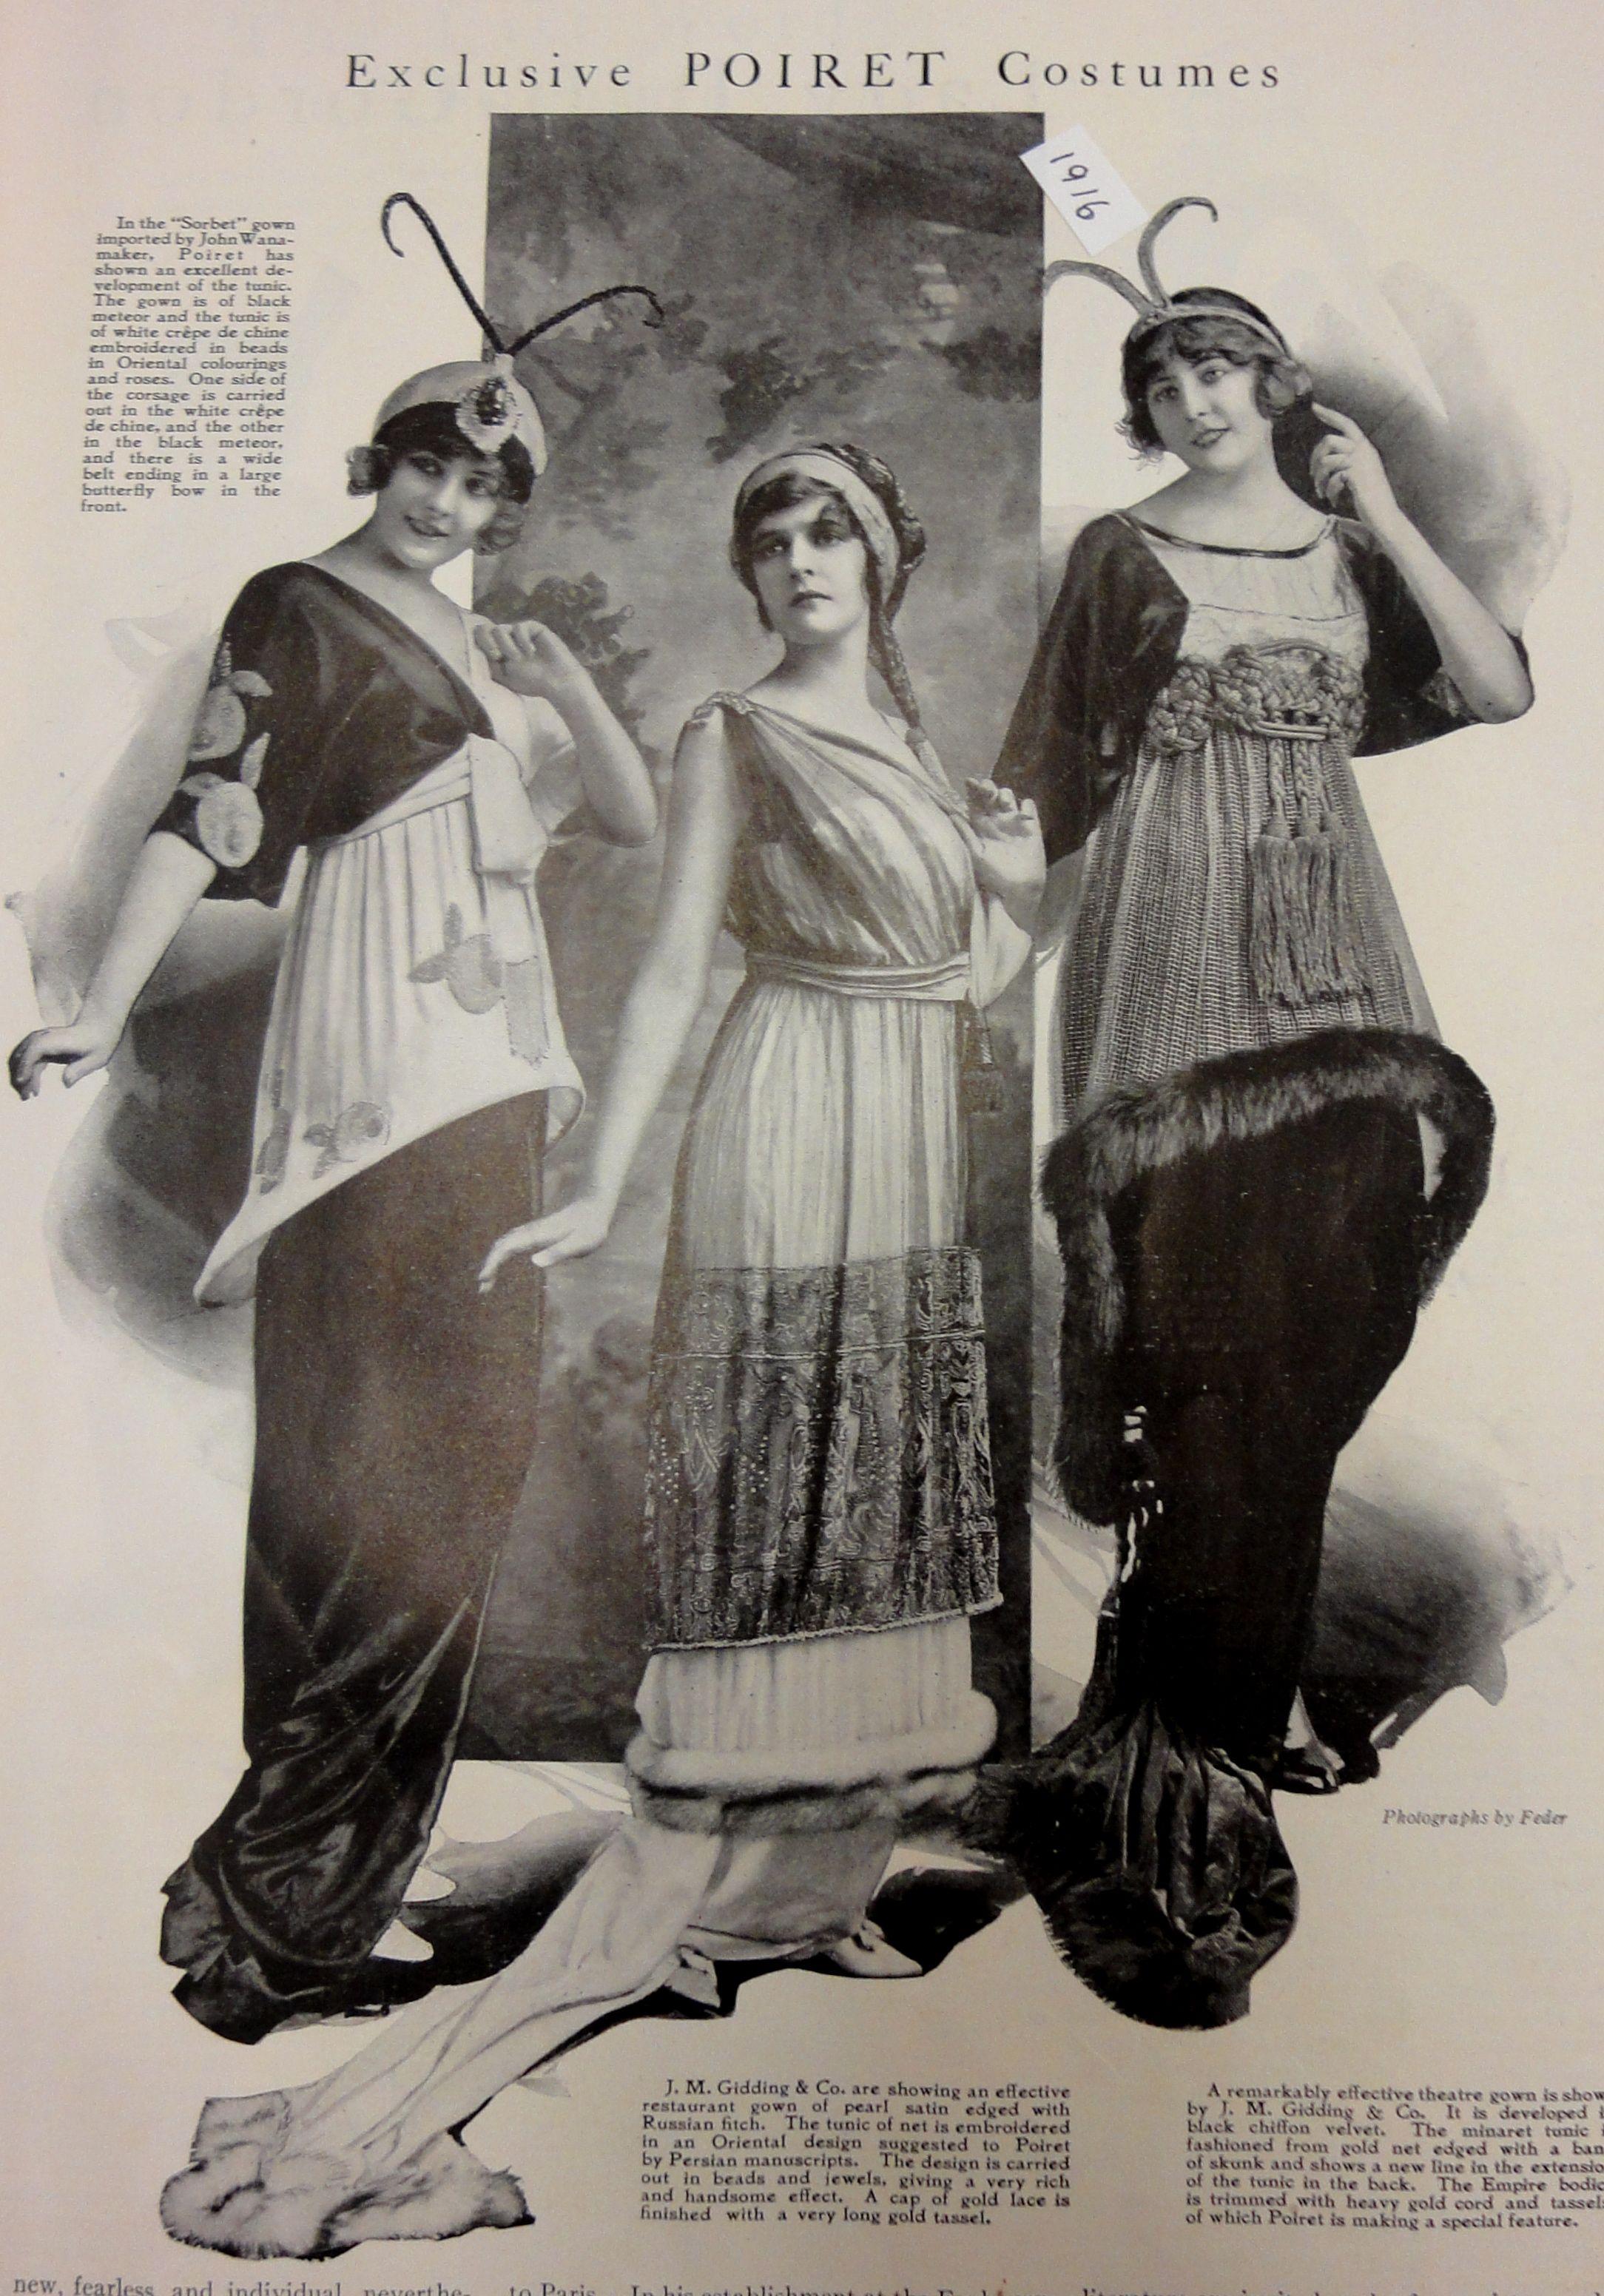 Pin By Jmagana On 1910s Fashion Paul Poiret Edwardian Fashion Art Deco Fashion